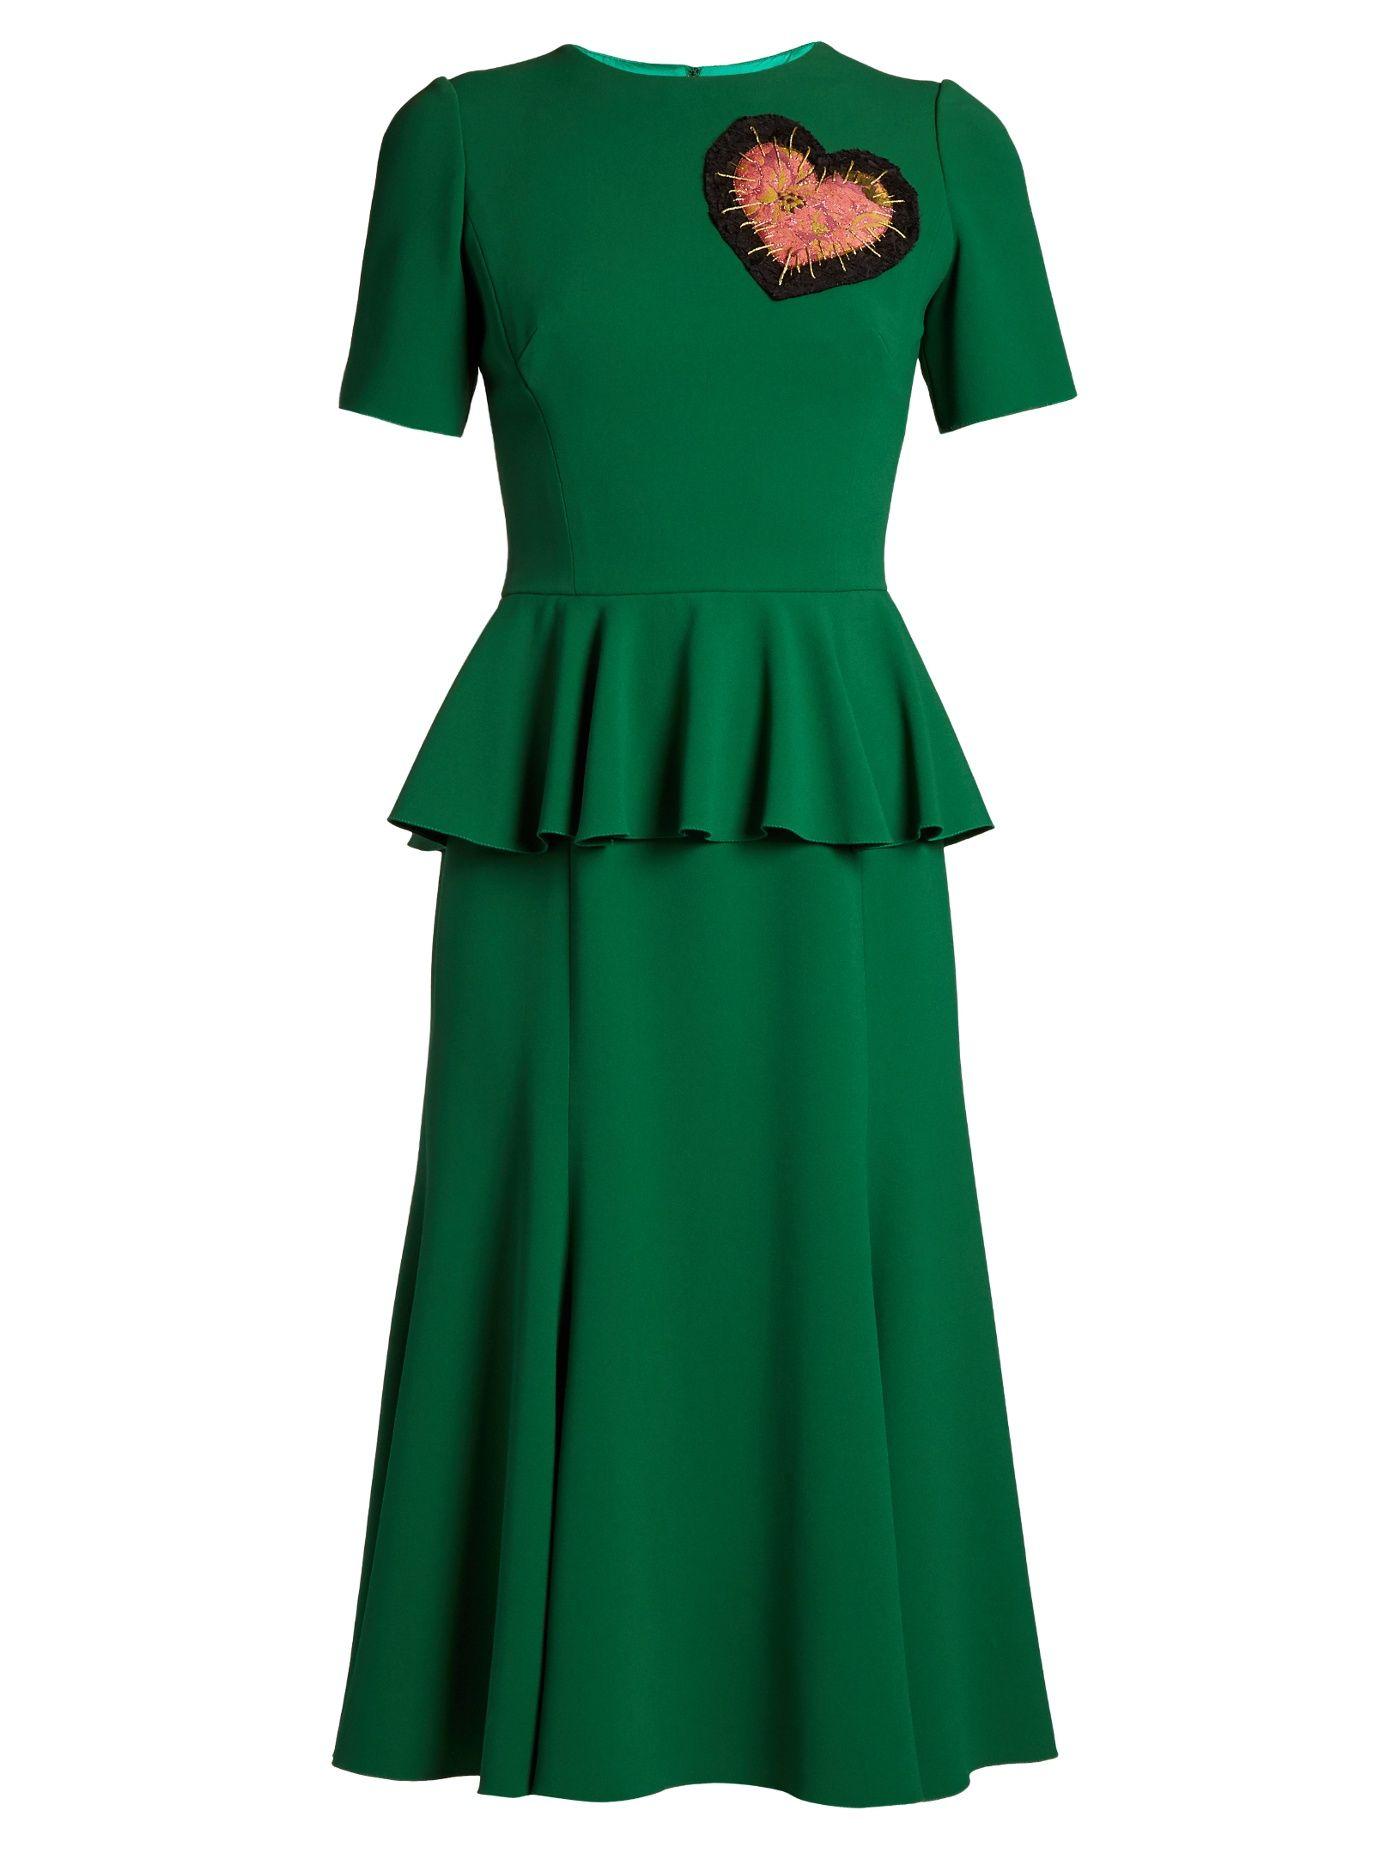 Embellished Heart Round Peplum Green Dress Gabbana In Dolceamp; Neck OZuXiPk